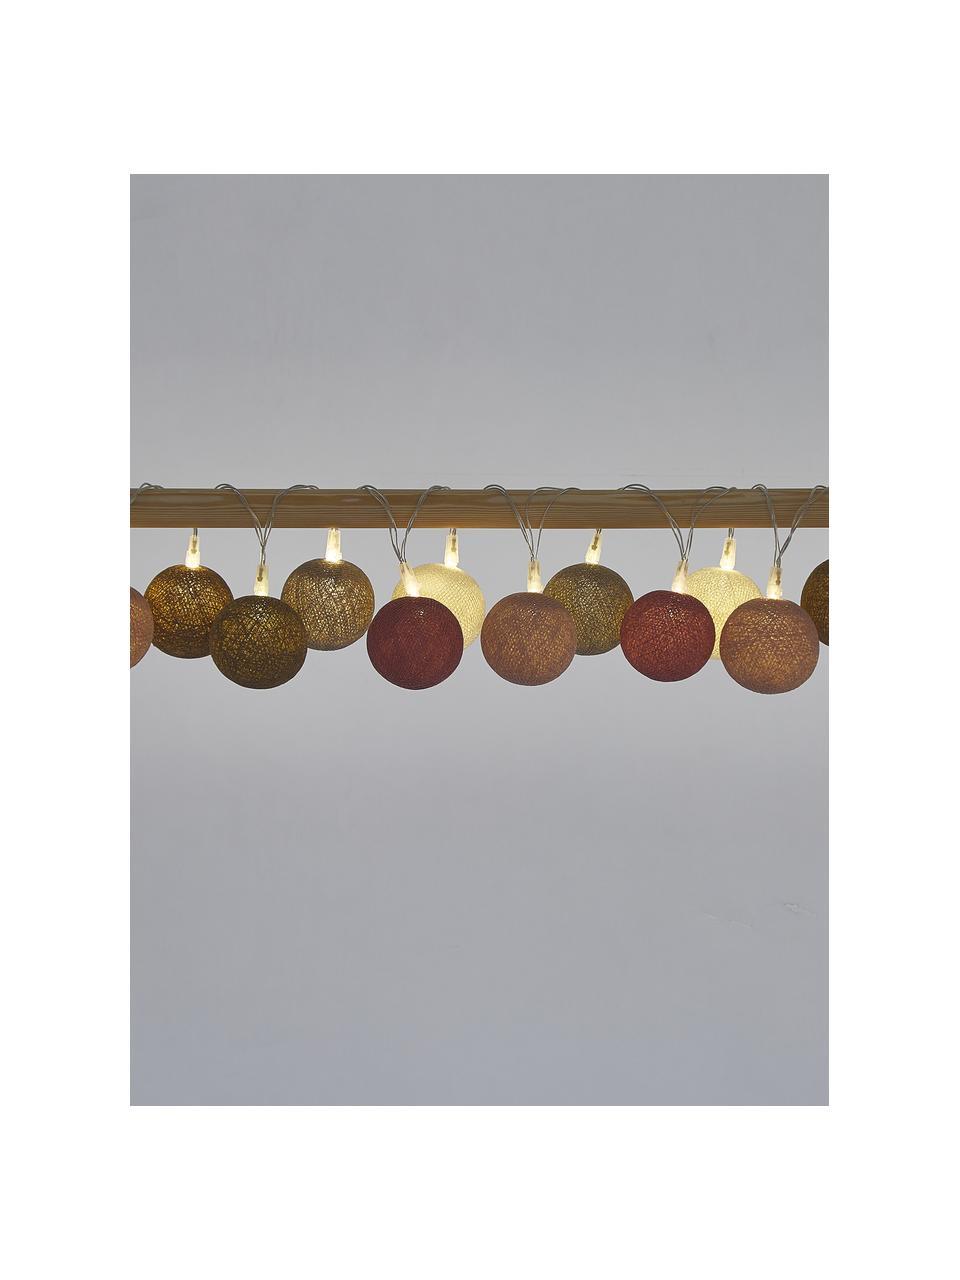 LED-Lichterkette Colorain, 378 cm, 20 Lampions, Braun, Rosa, Cremeweiß, Grau, L 378 cm